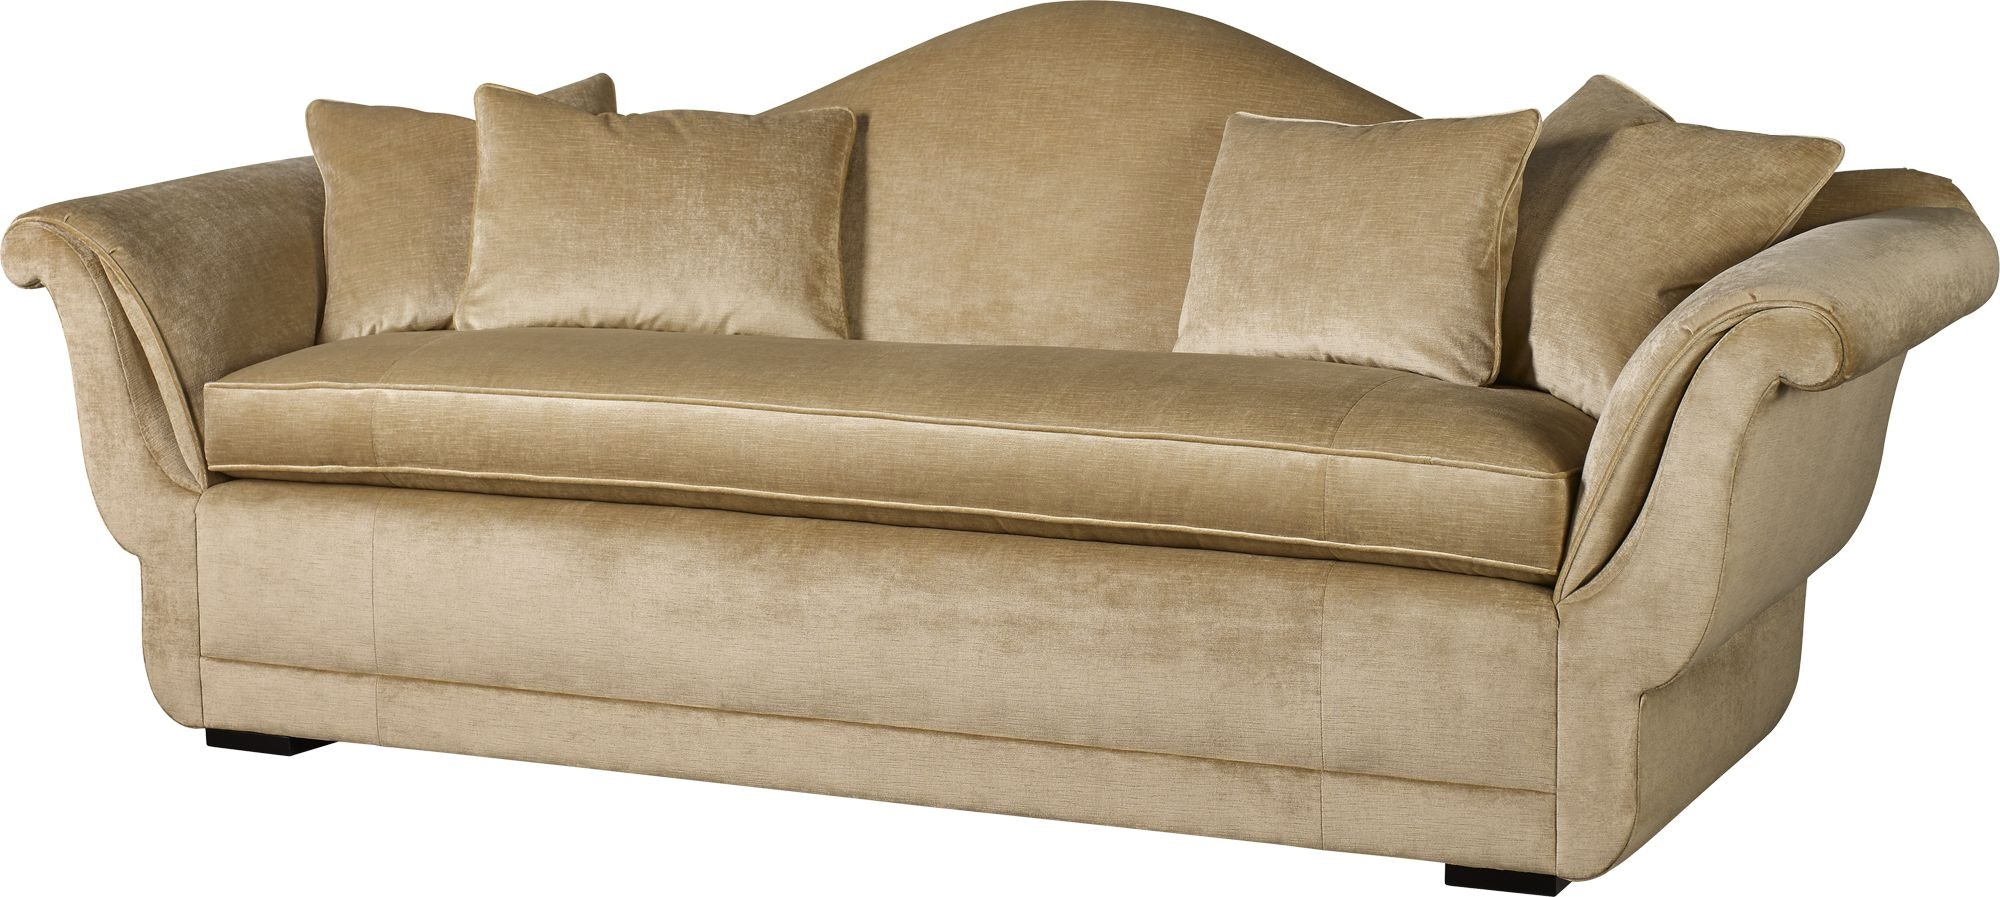 baker furniture max sofa white leather 2 seater recliner sofas presidio barbara barry